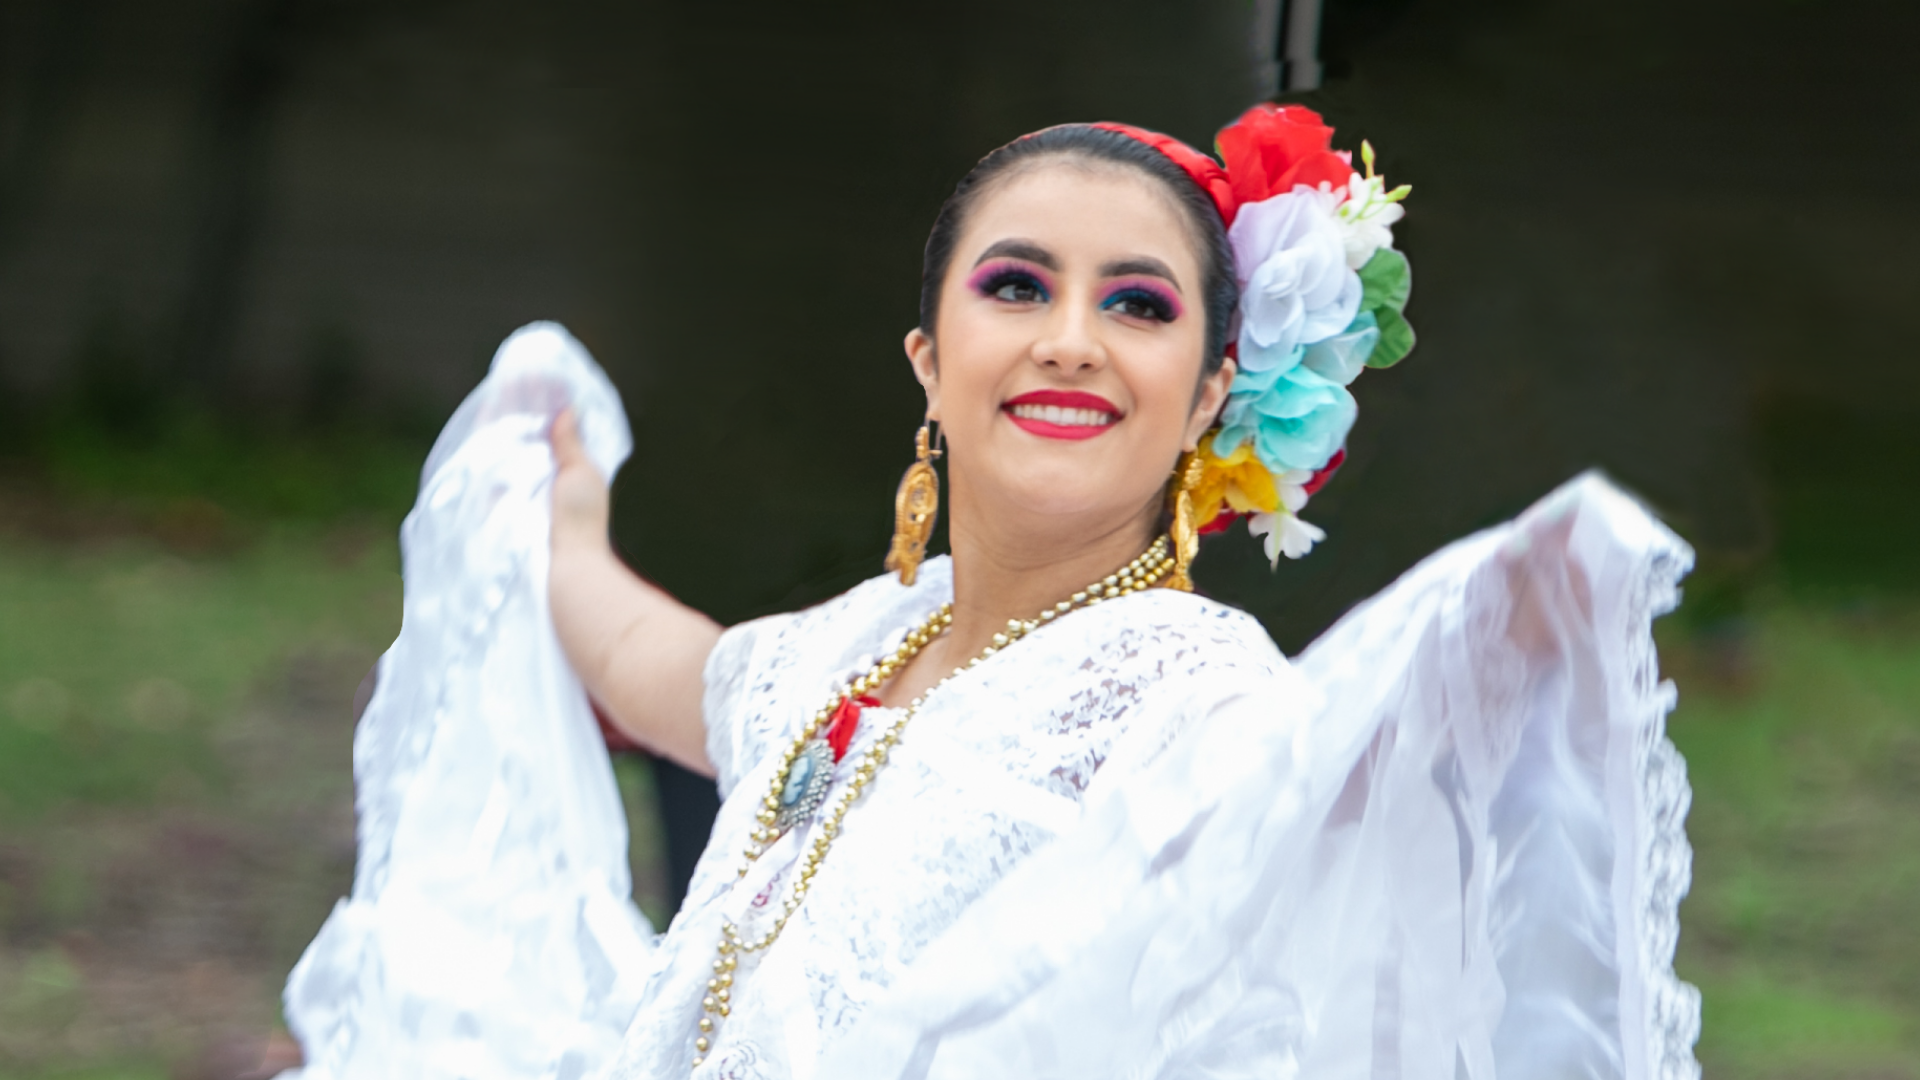 National Hispanic Heritage Month - Ballet Folklórico